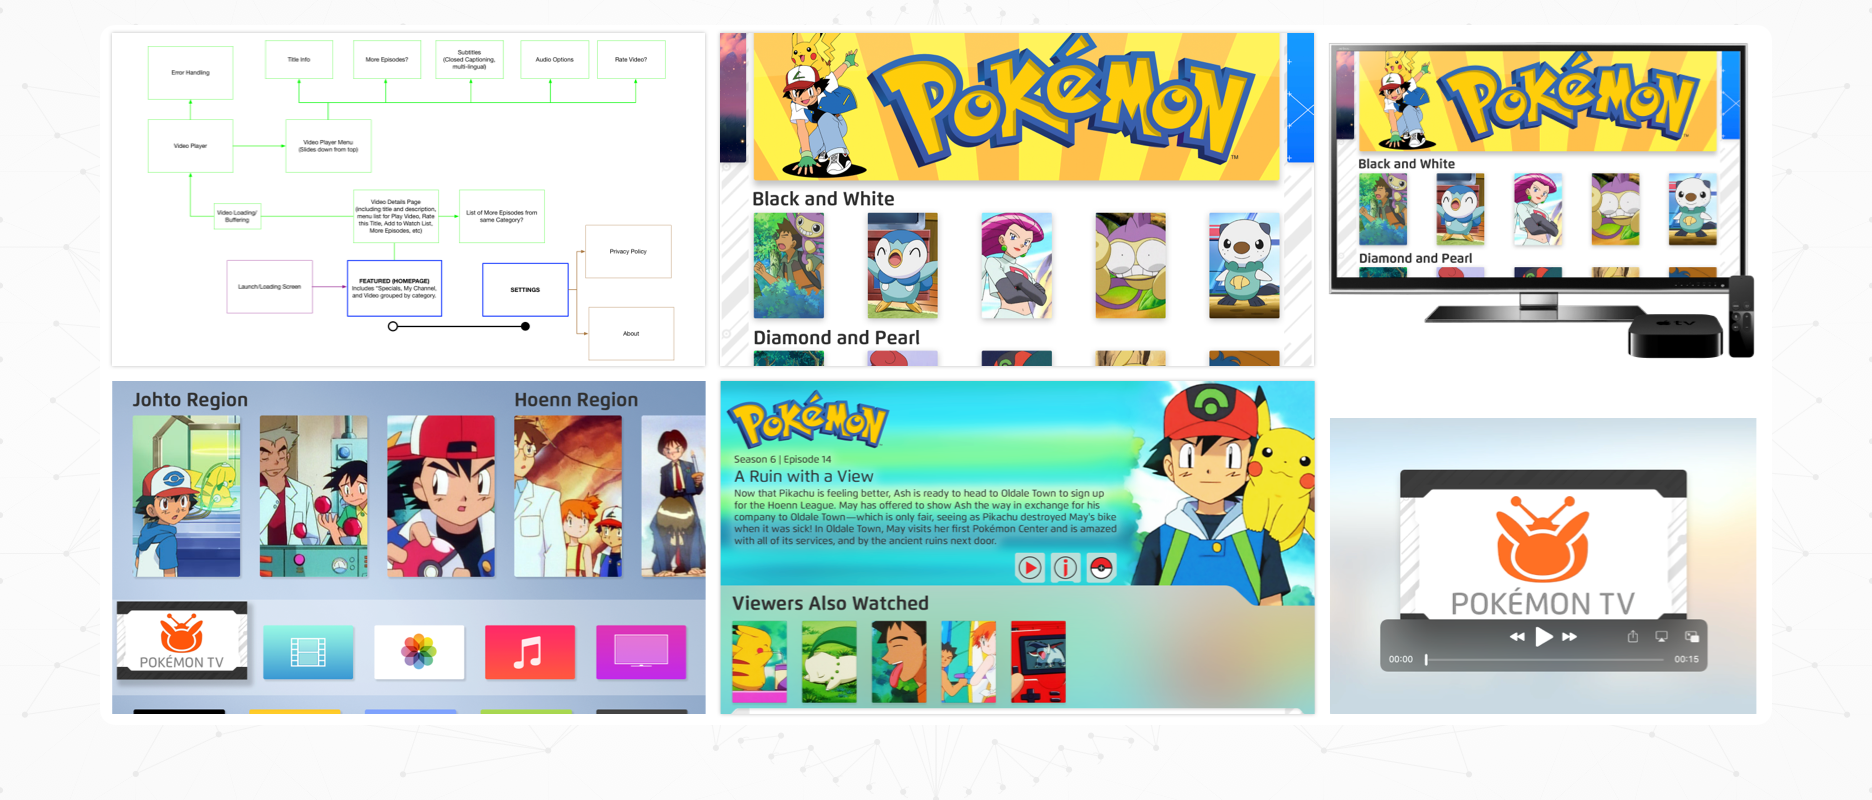 Pokémon TV - Case Study Image - Set Top Box